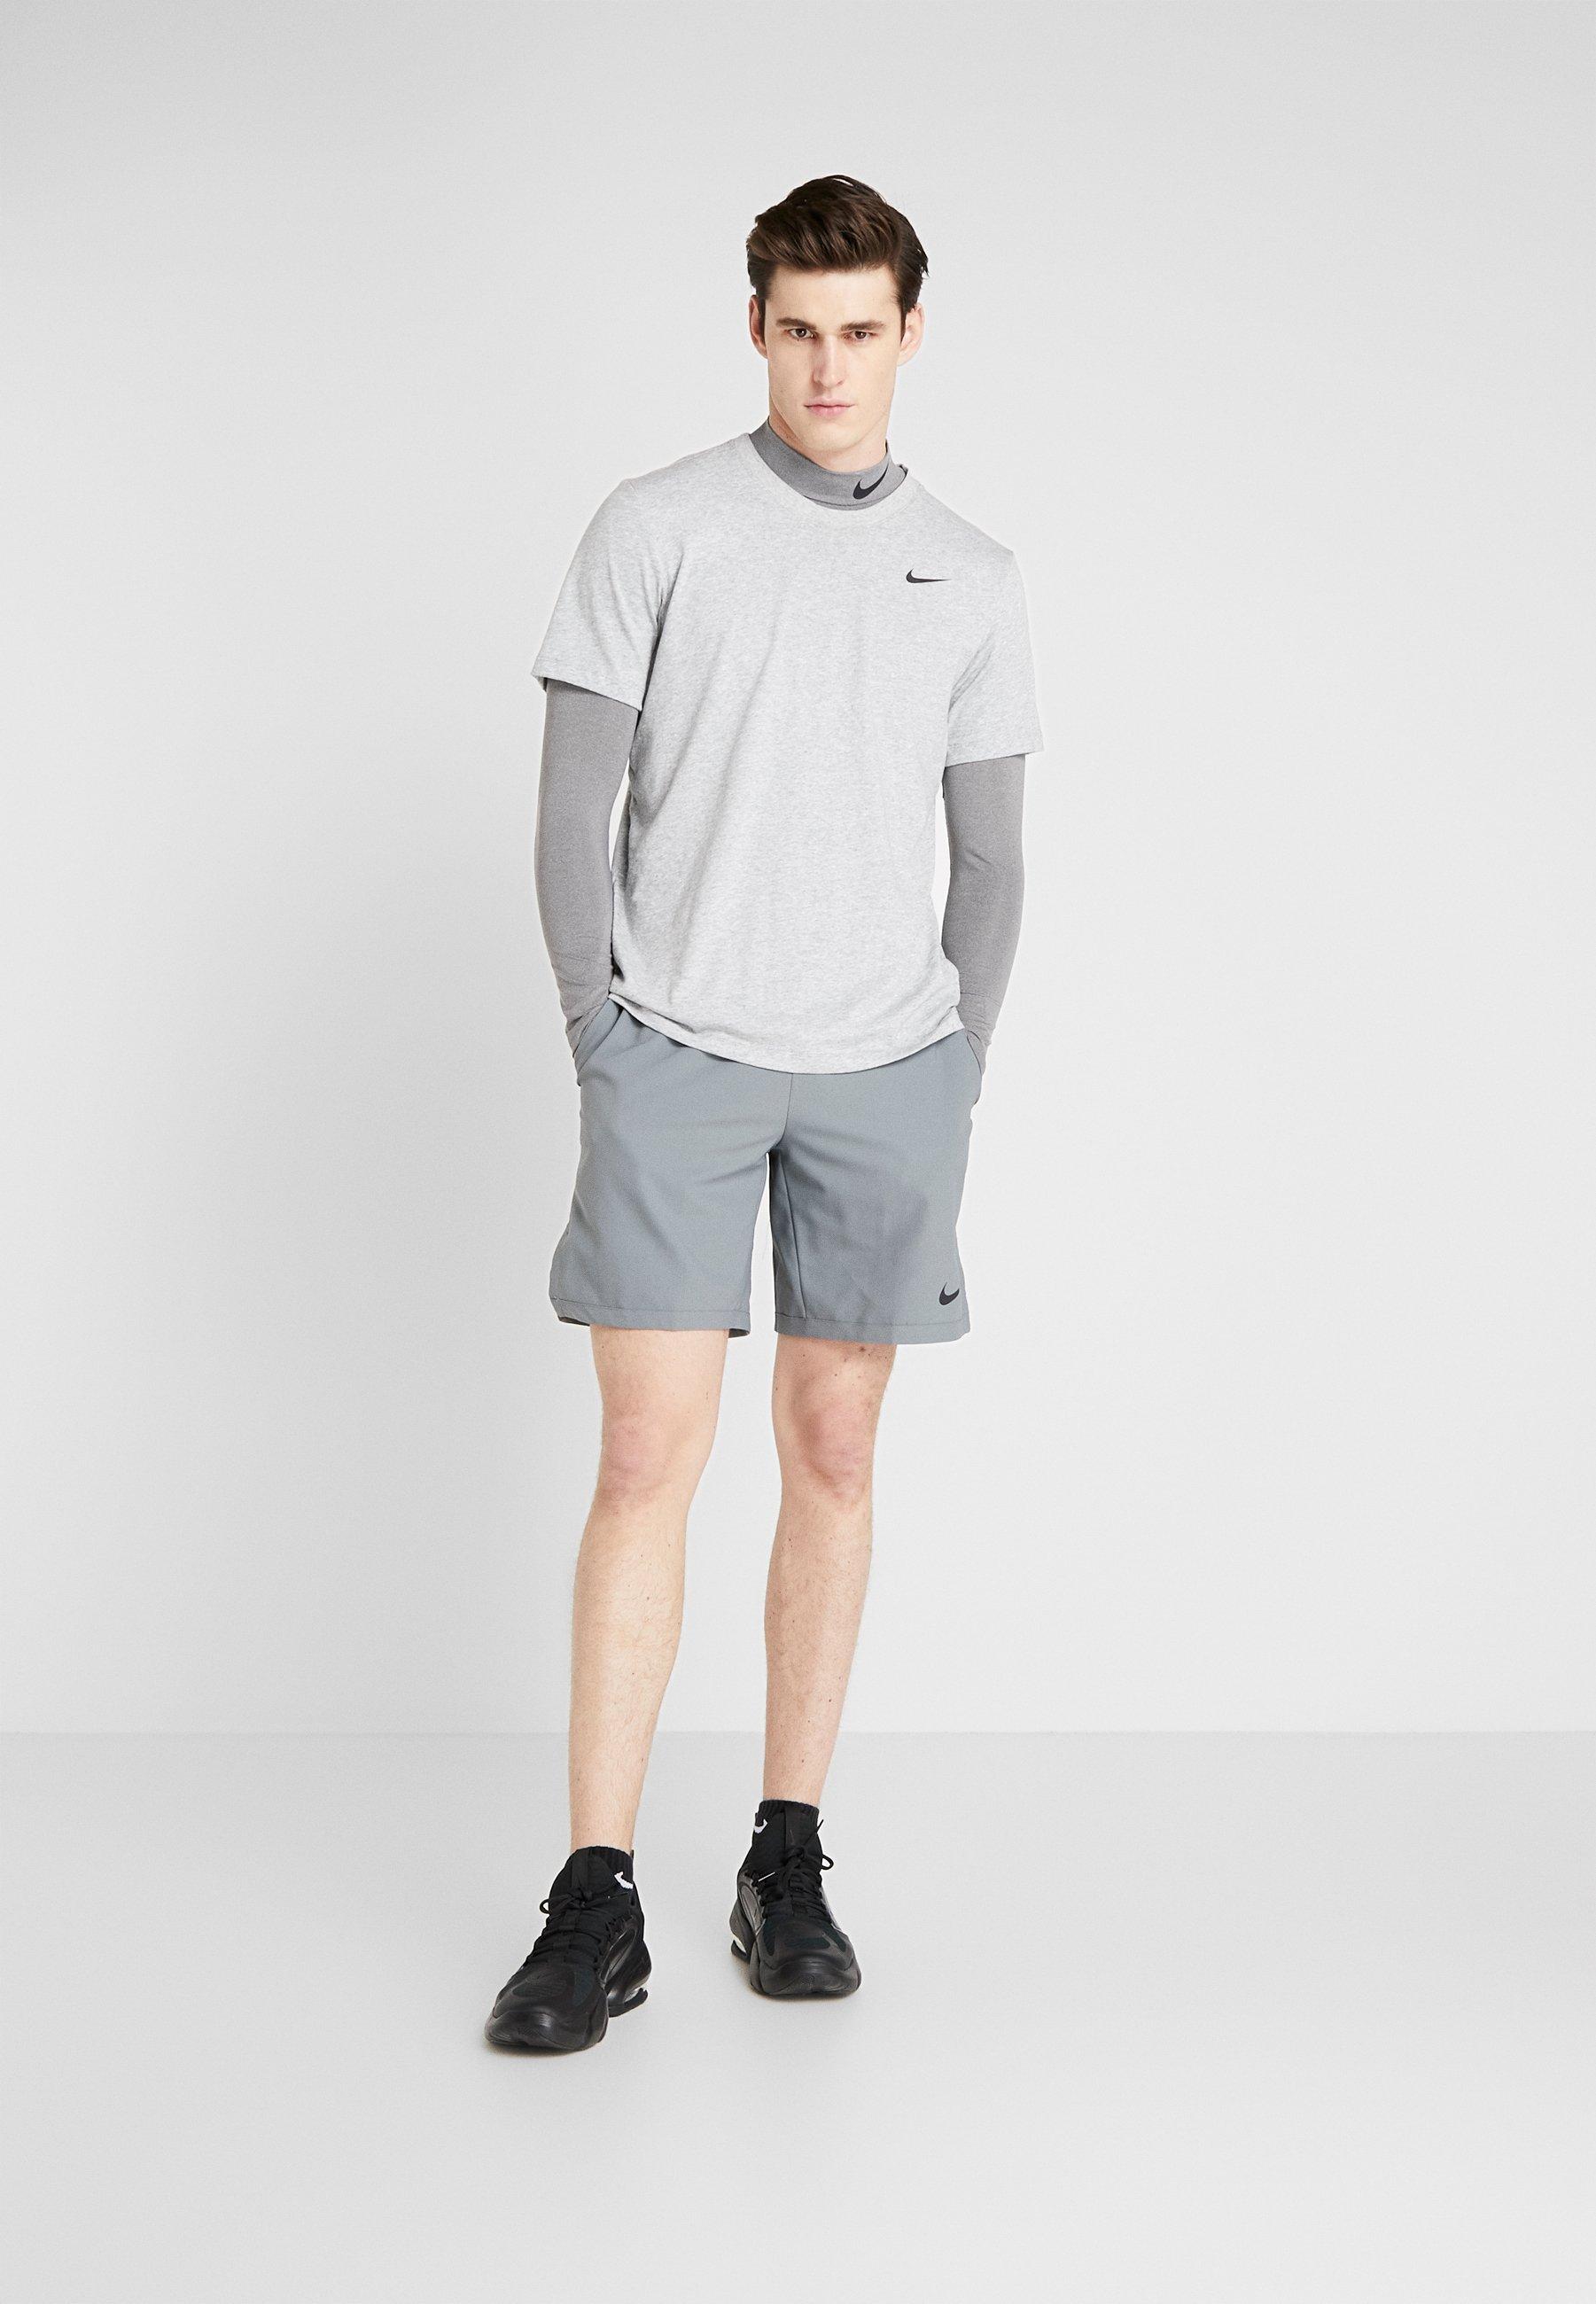 Nike Performance Vent Max 3.0 - Träningsshorts Smoke Grey/black